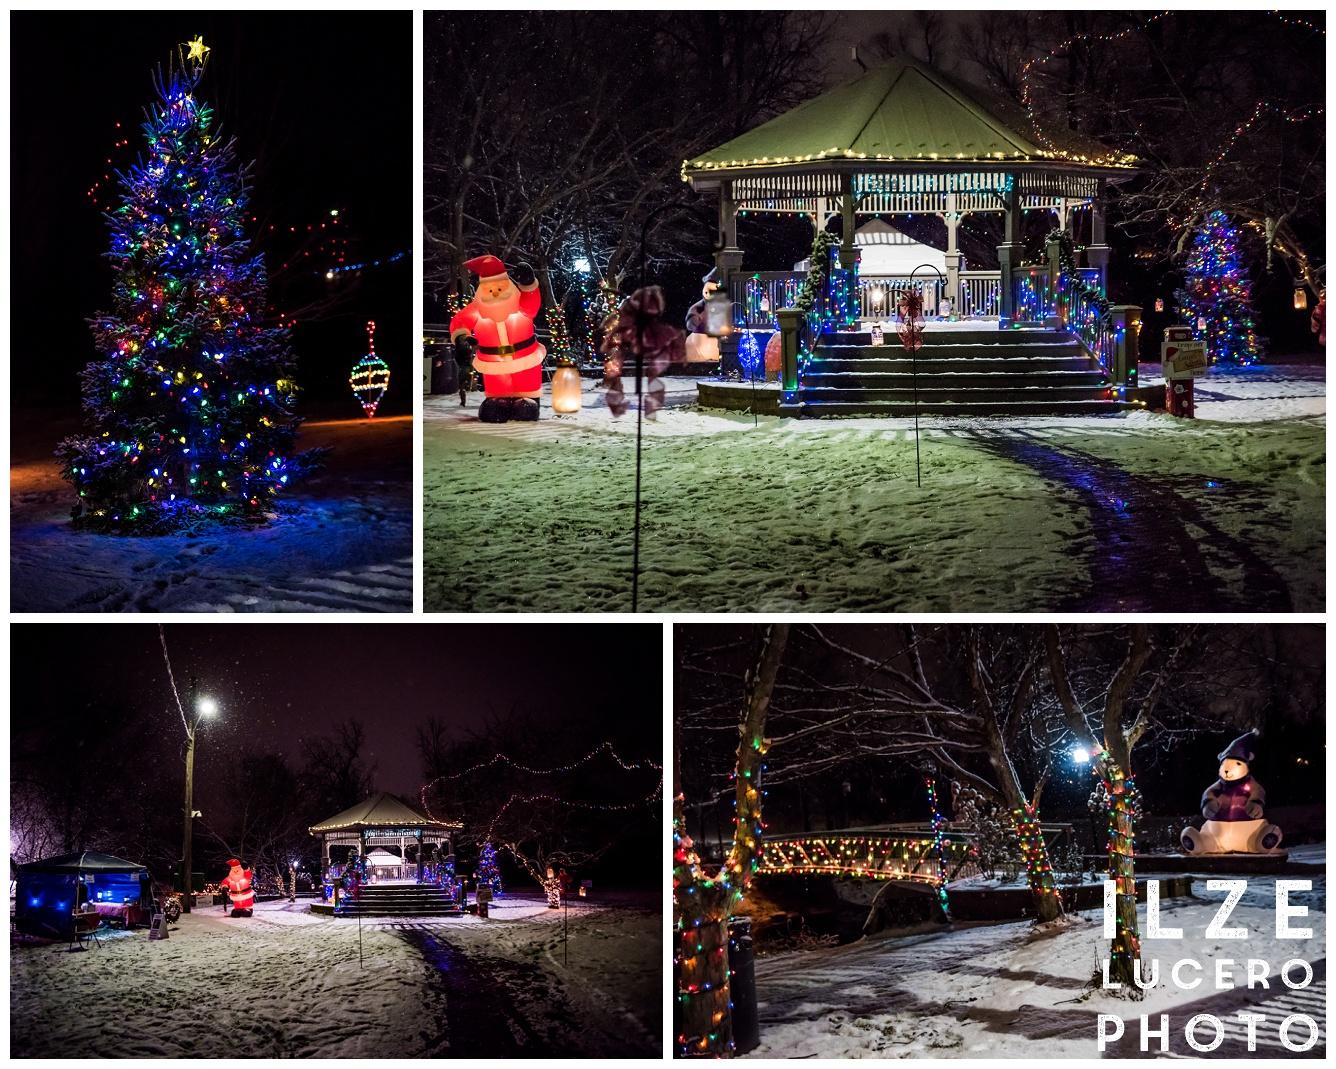 Clarkston Christmas teree Depot Park